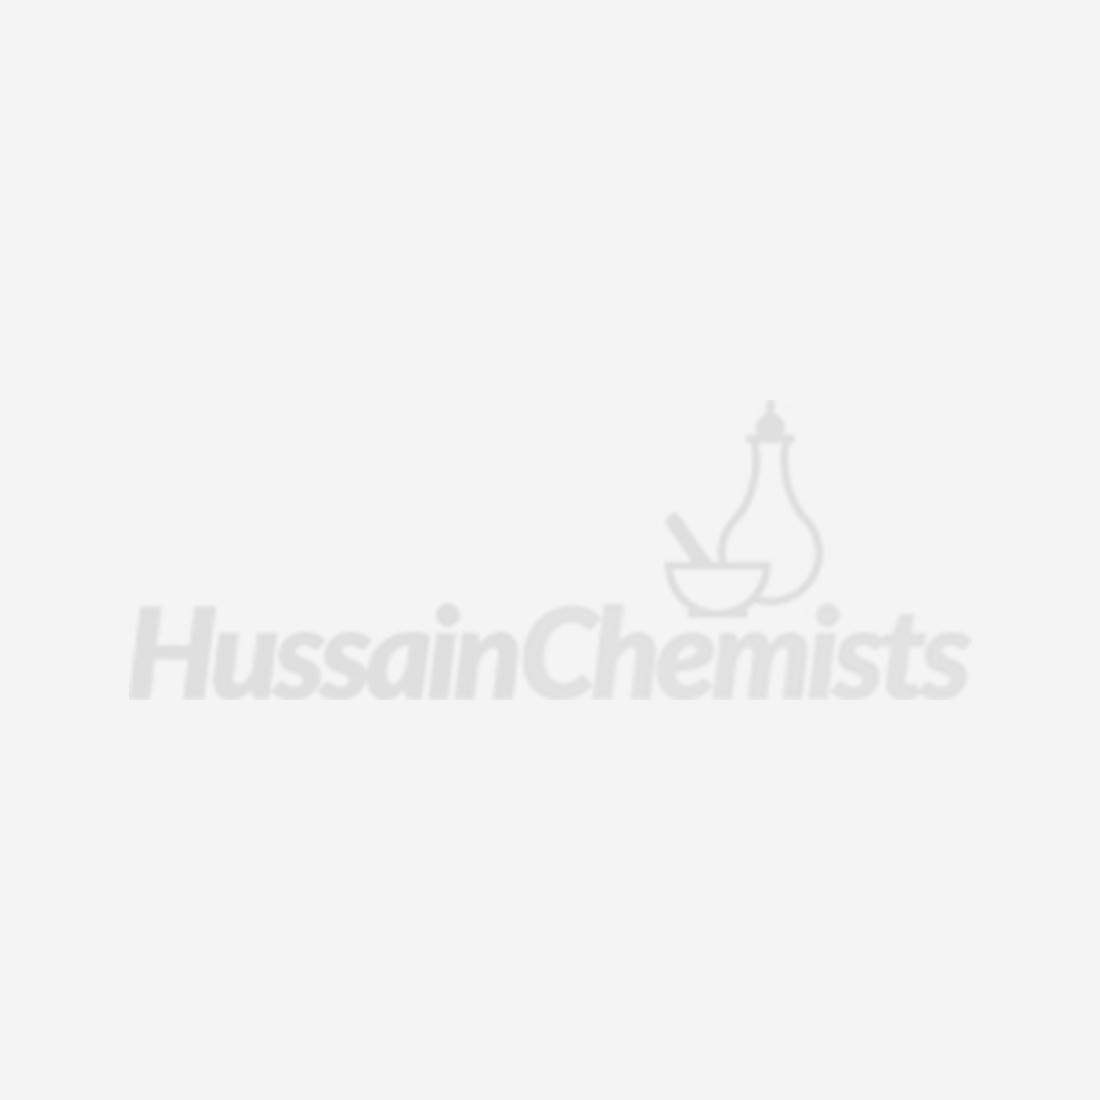 Otrivine Extra Dual Relief 0.5mgml 0.6mgml nasal spray